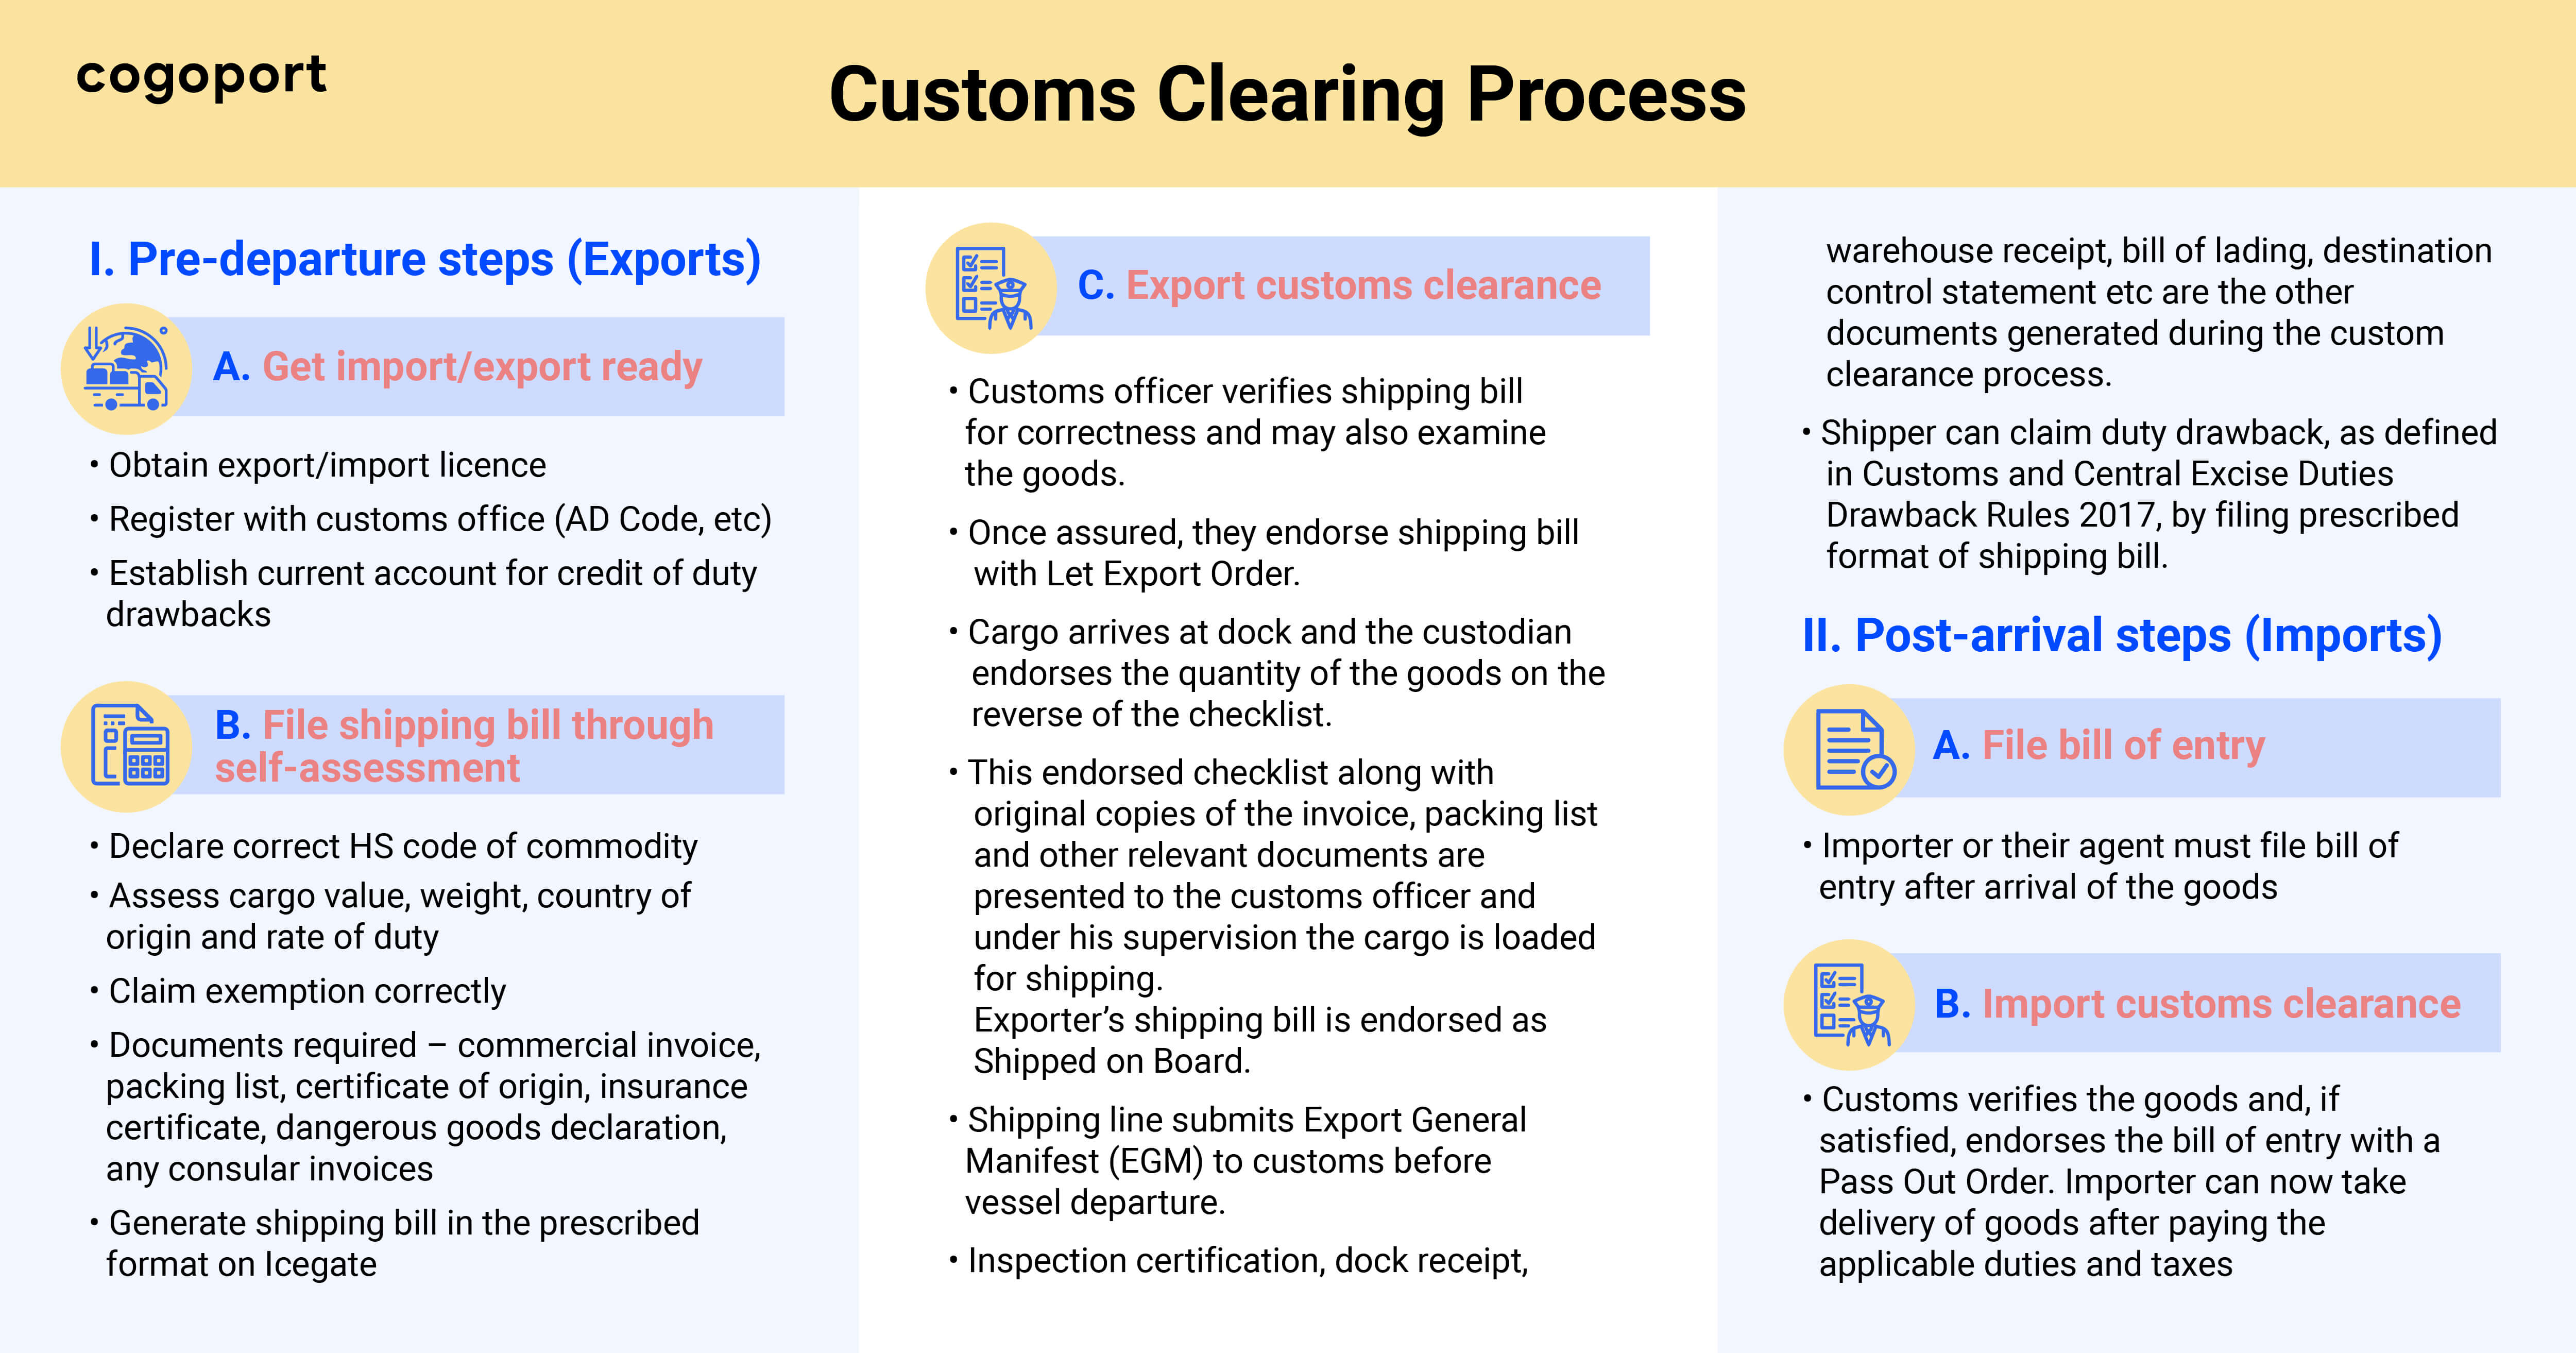 Step by step custom Clearance process